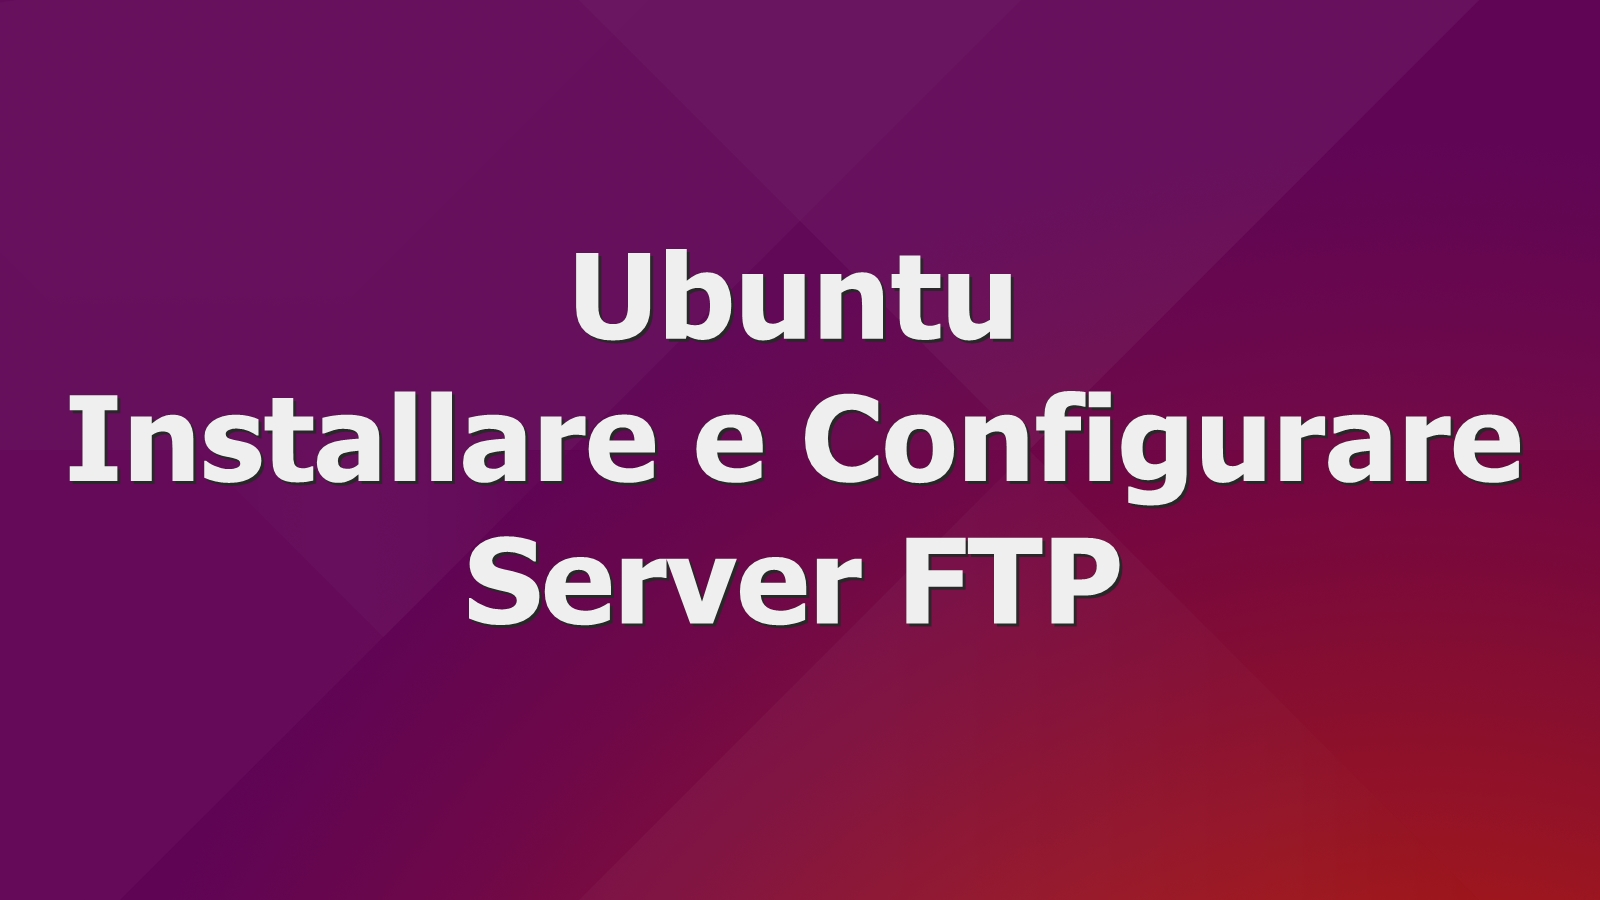 Ubuntu - Installare e Configurare Server FTP